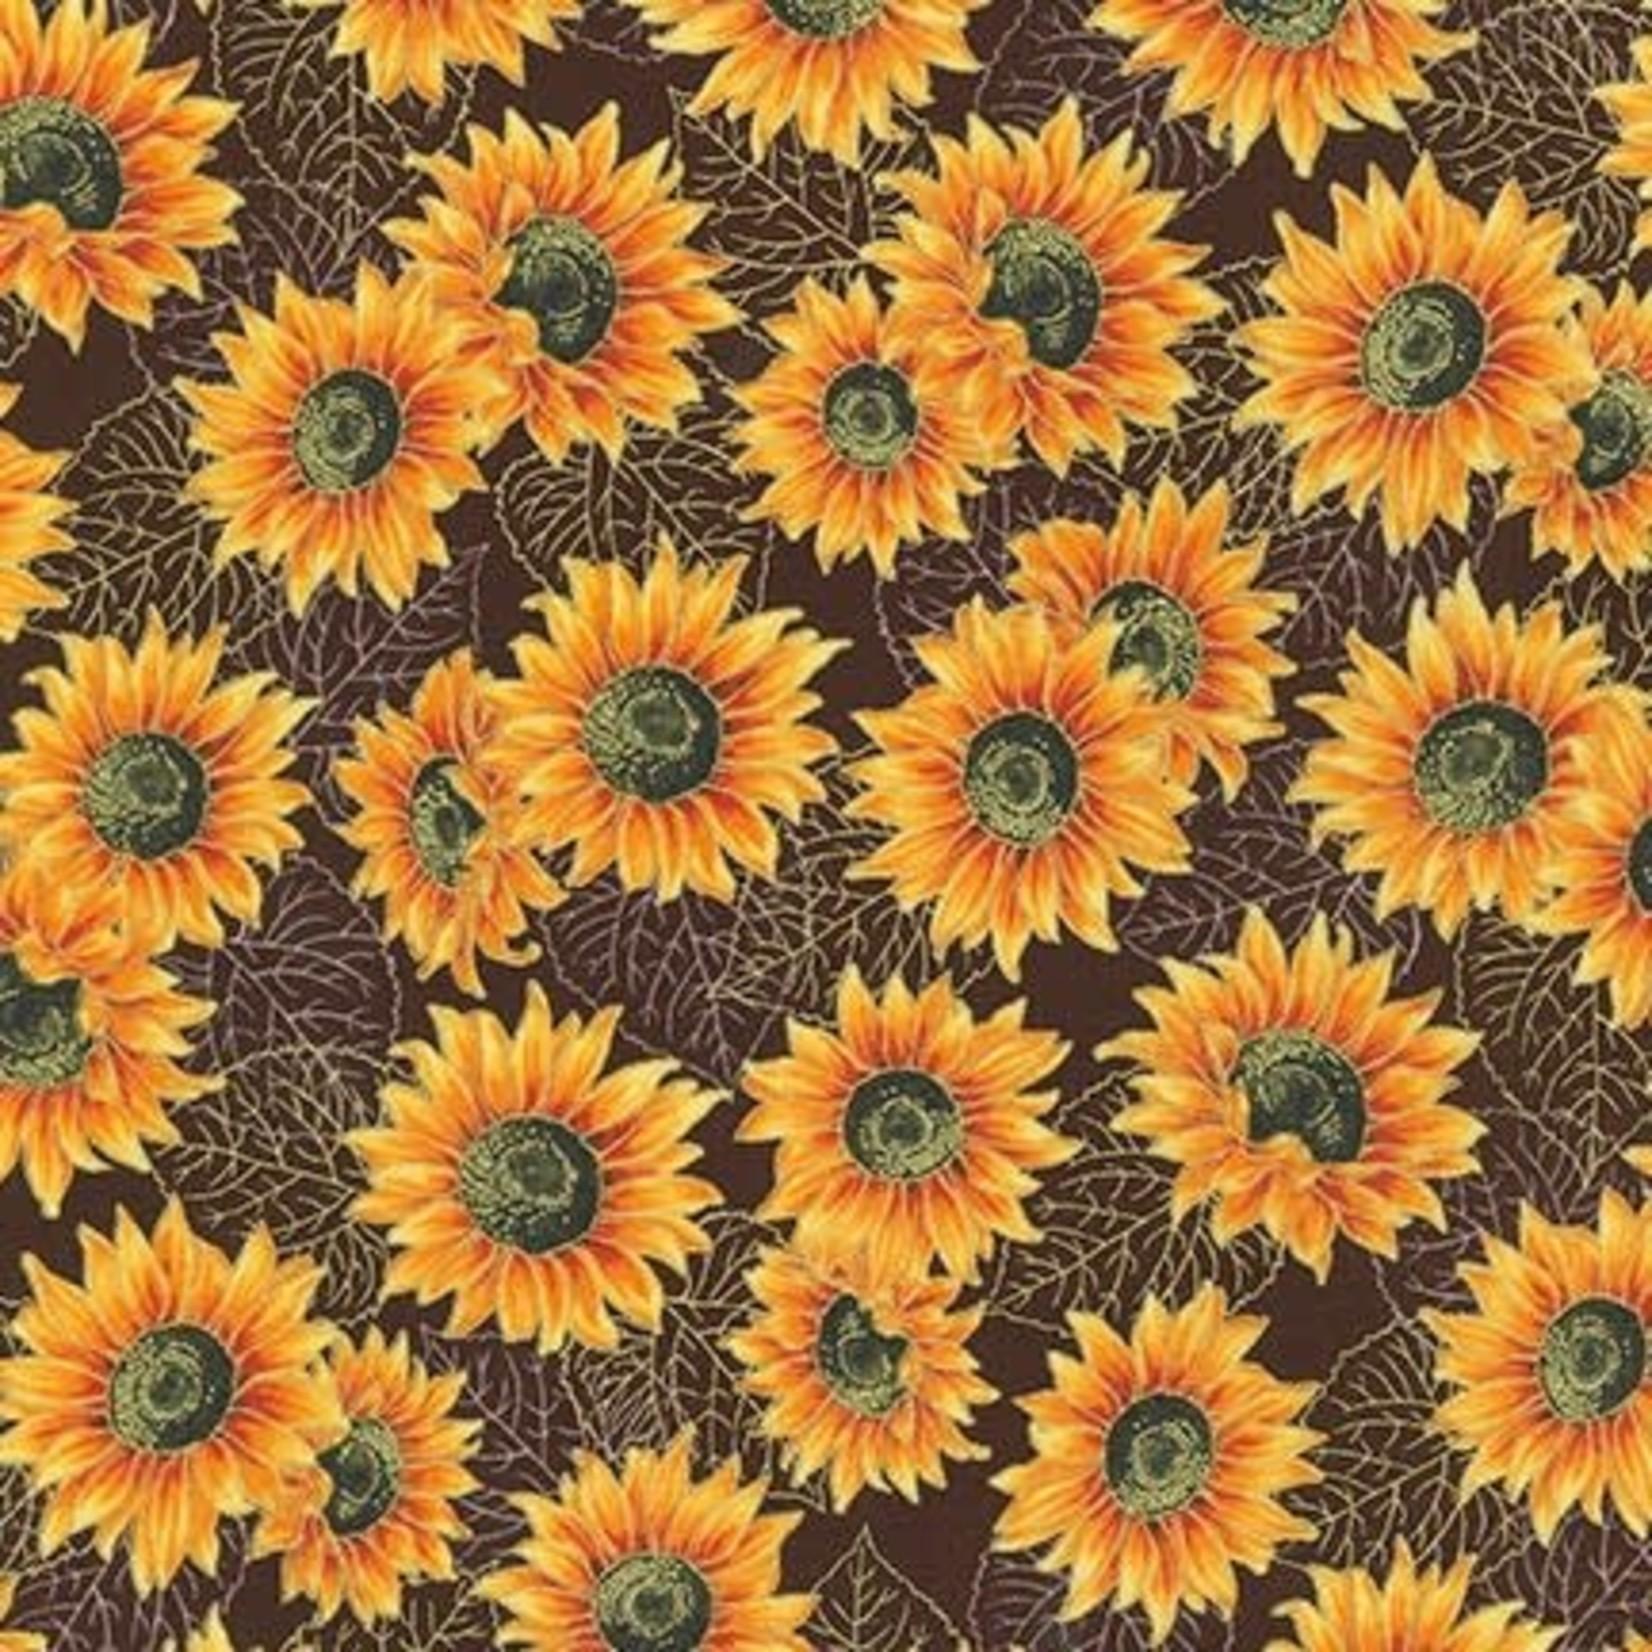 ROBERT KAUFMAN Autumn Beauties, SUNFLOWERS, BROWN (19320-16) $0.20/cm or $20/m